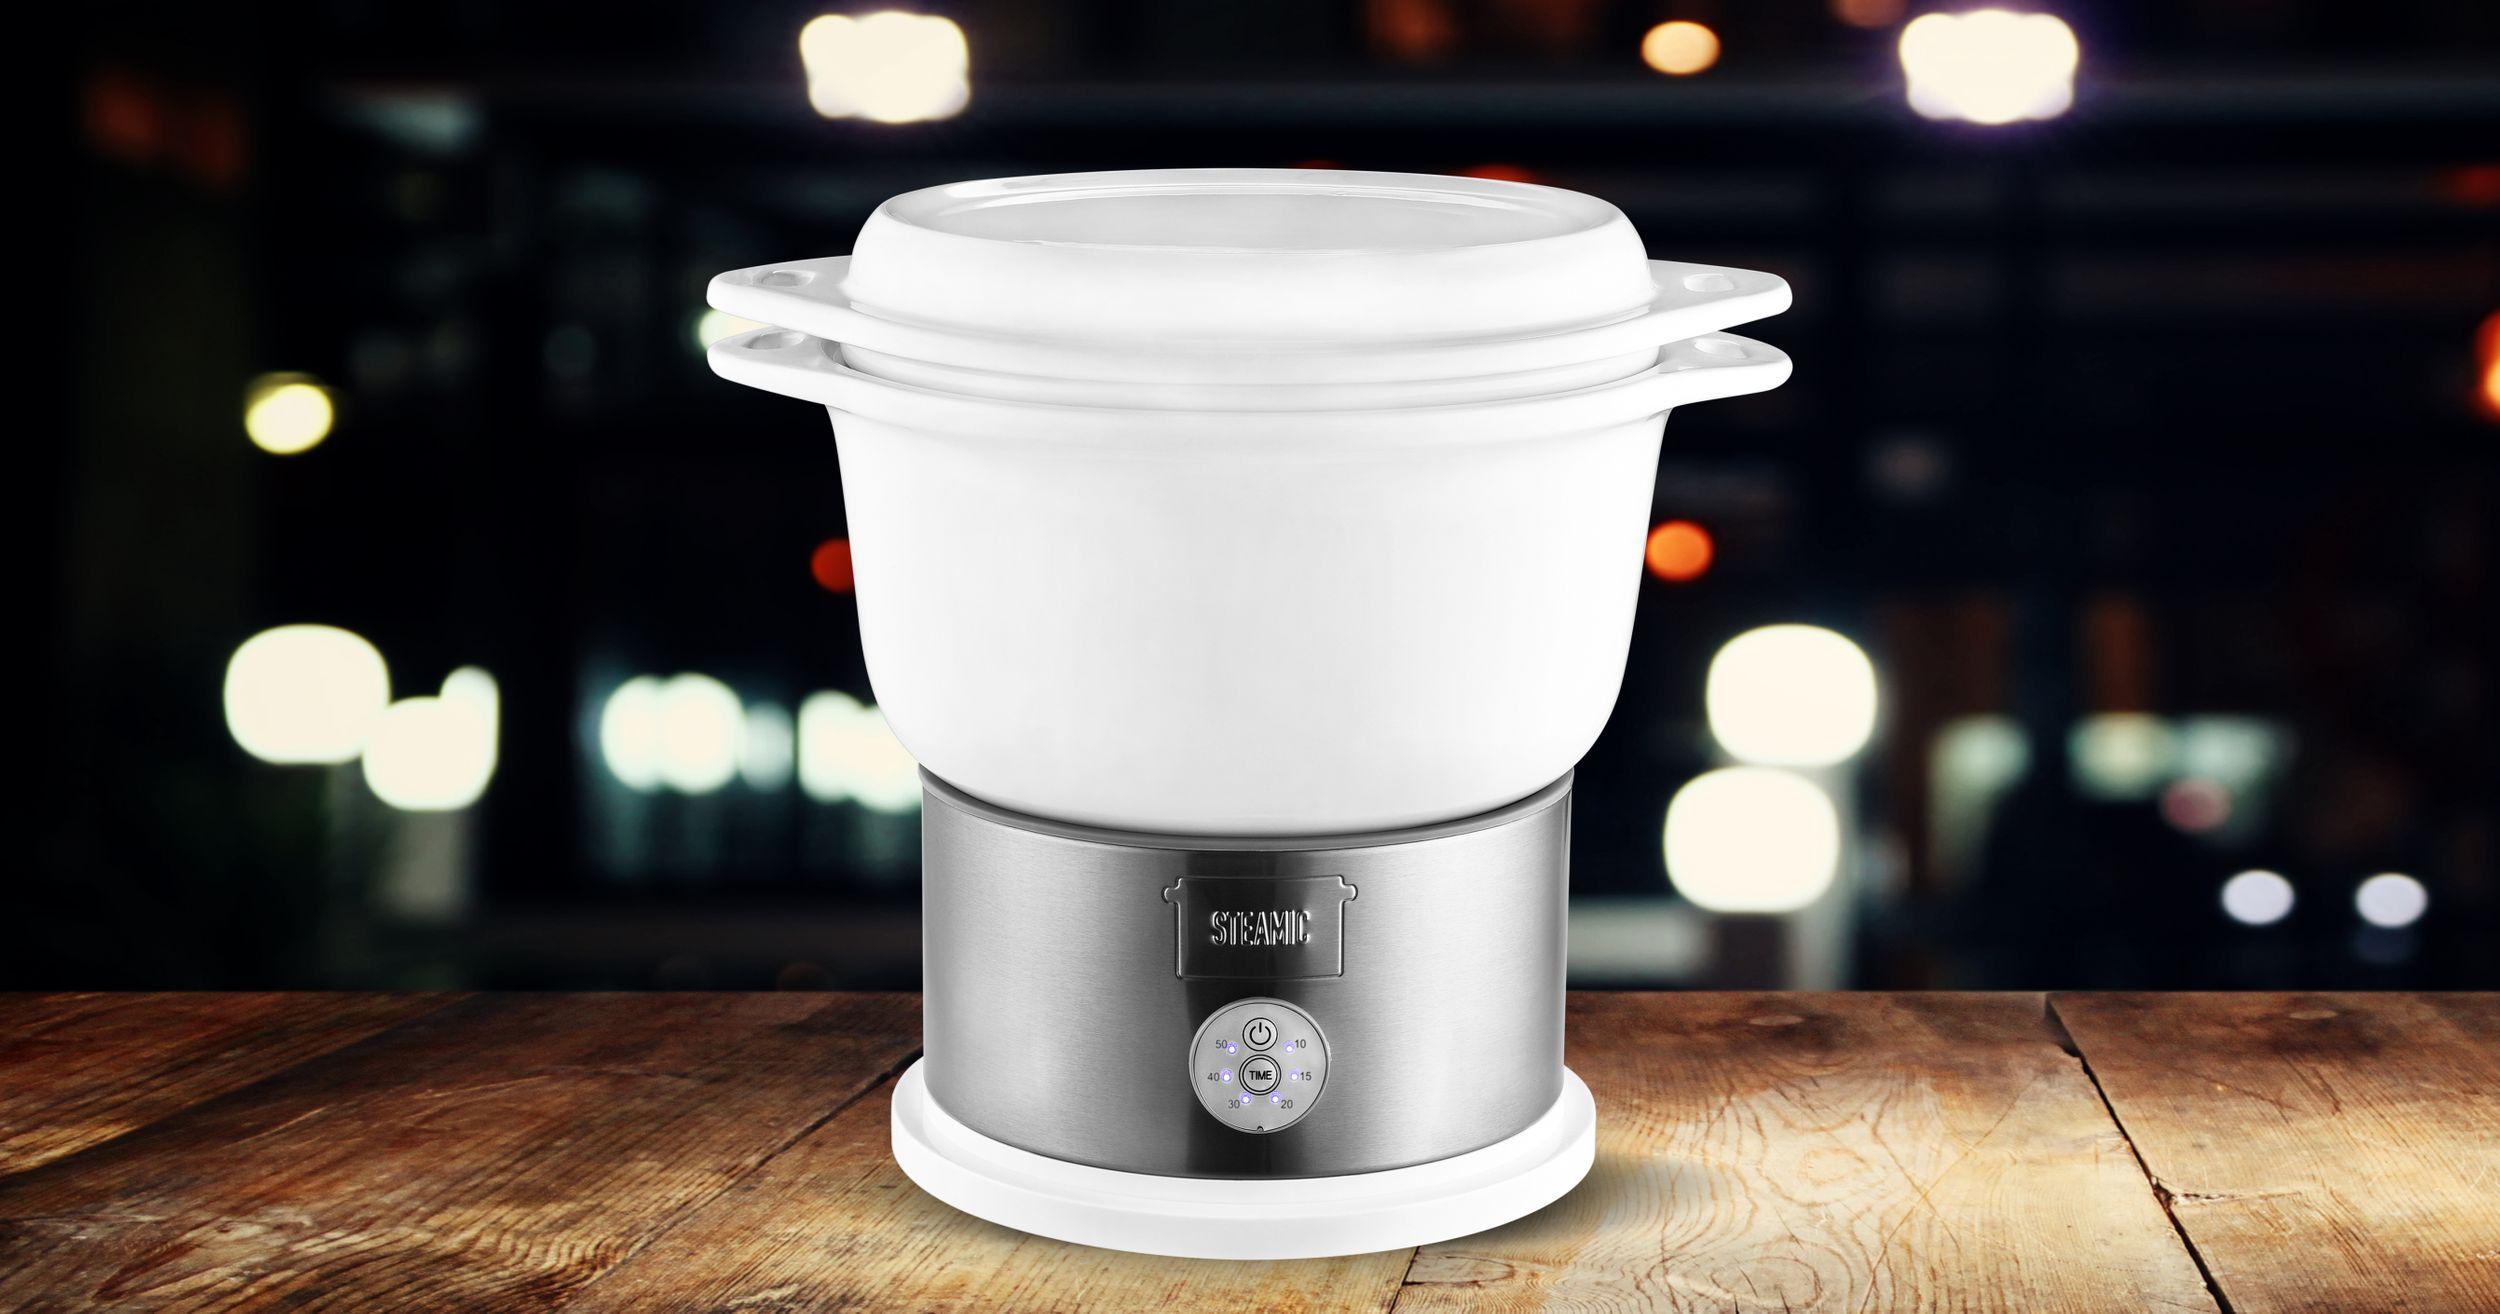 KERAMIK Dampfgarer BPA-frei Timer One-Touch-Bedienung 4,5 L (Karton beschädigt)*40382